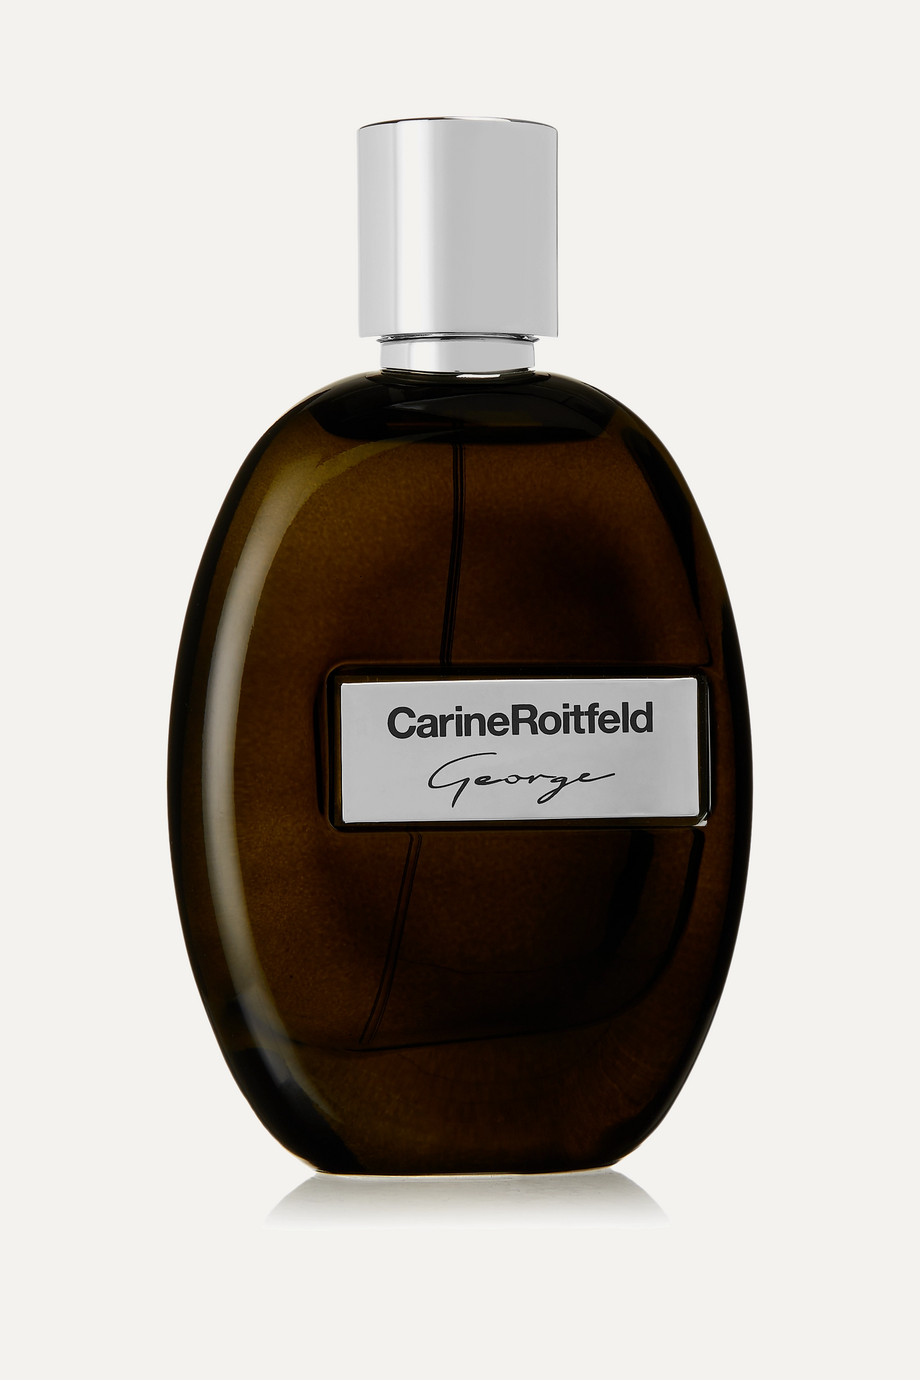 Carine Roitfeld Parfums Eau de Parfum - George, 90ml